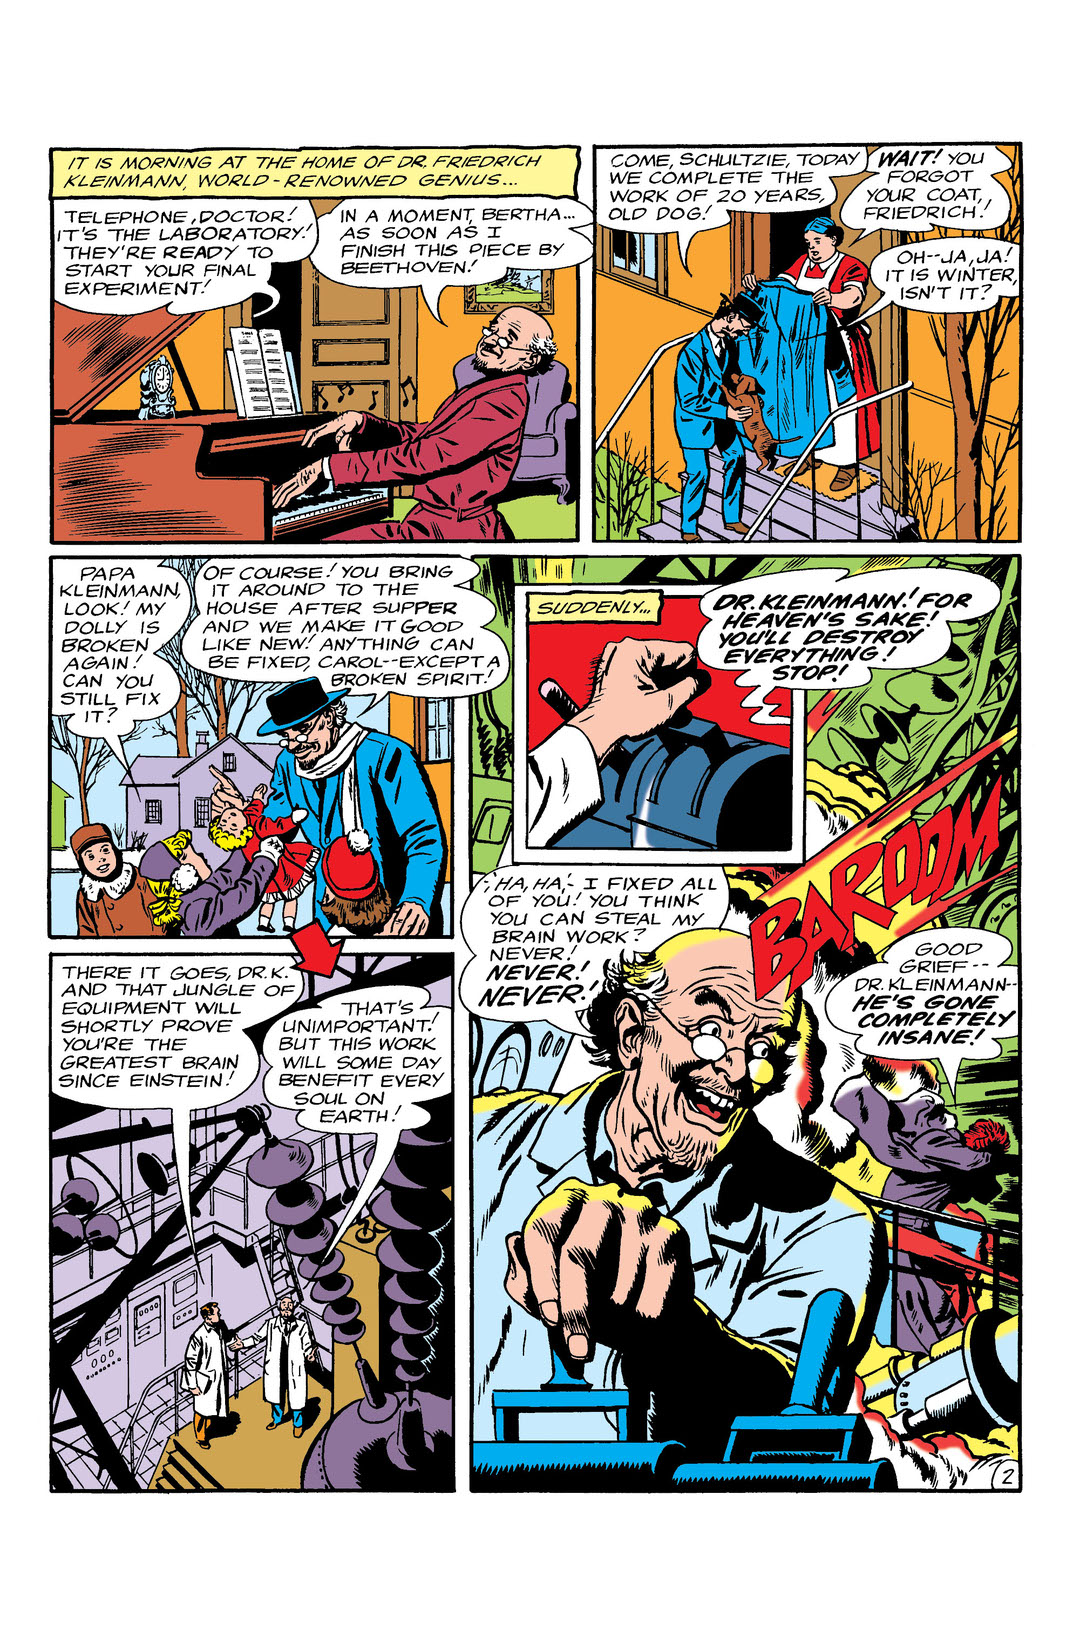 Read Doom Patrol (1964-) #96 on DC Universe